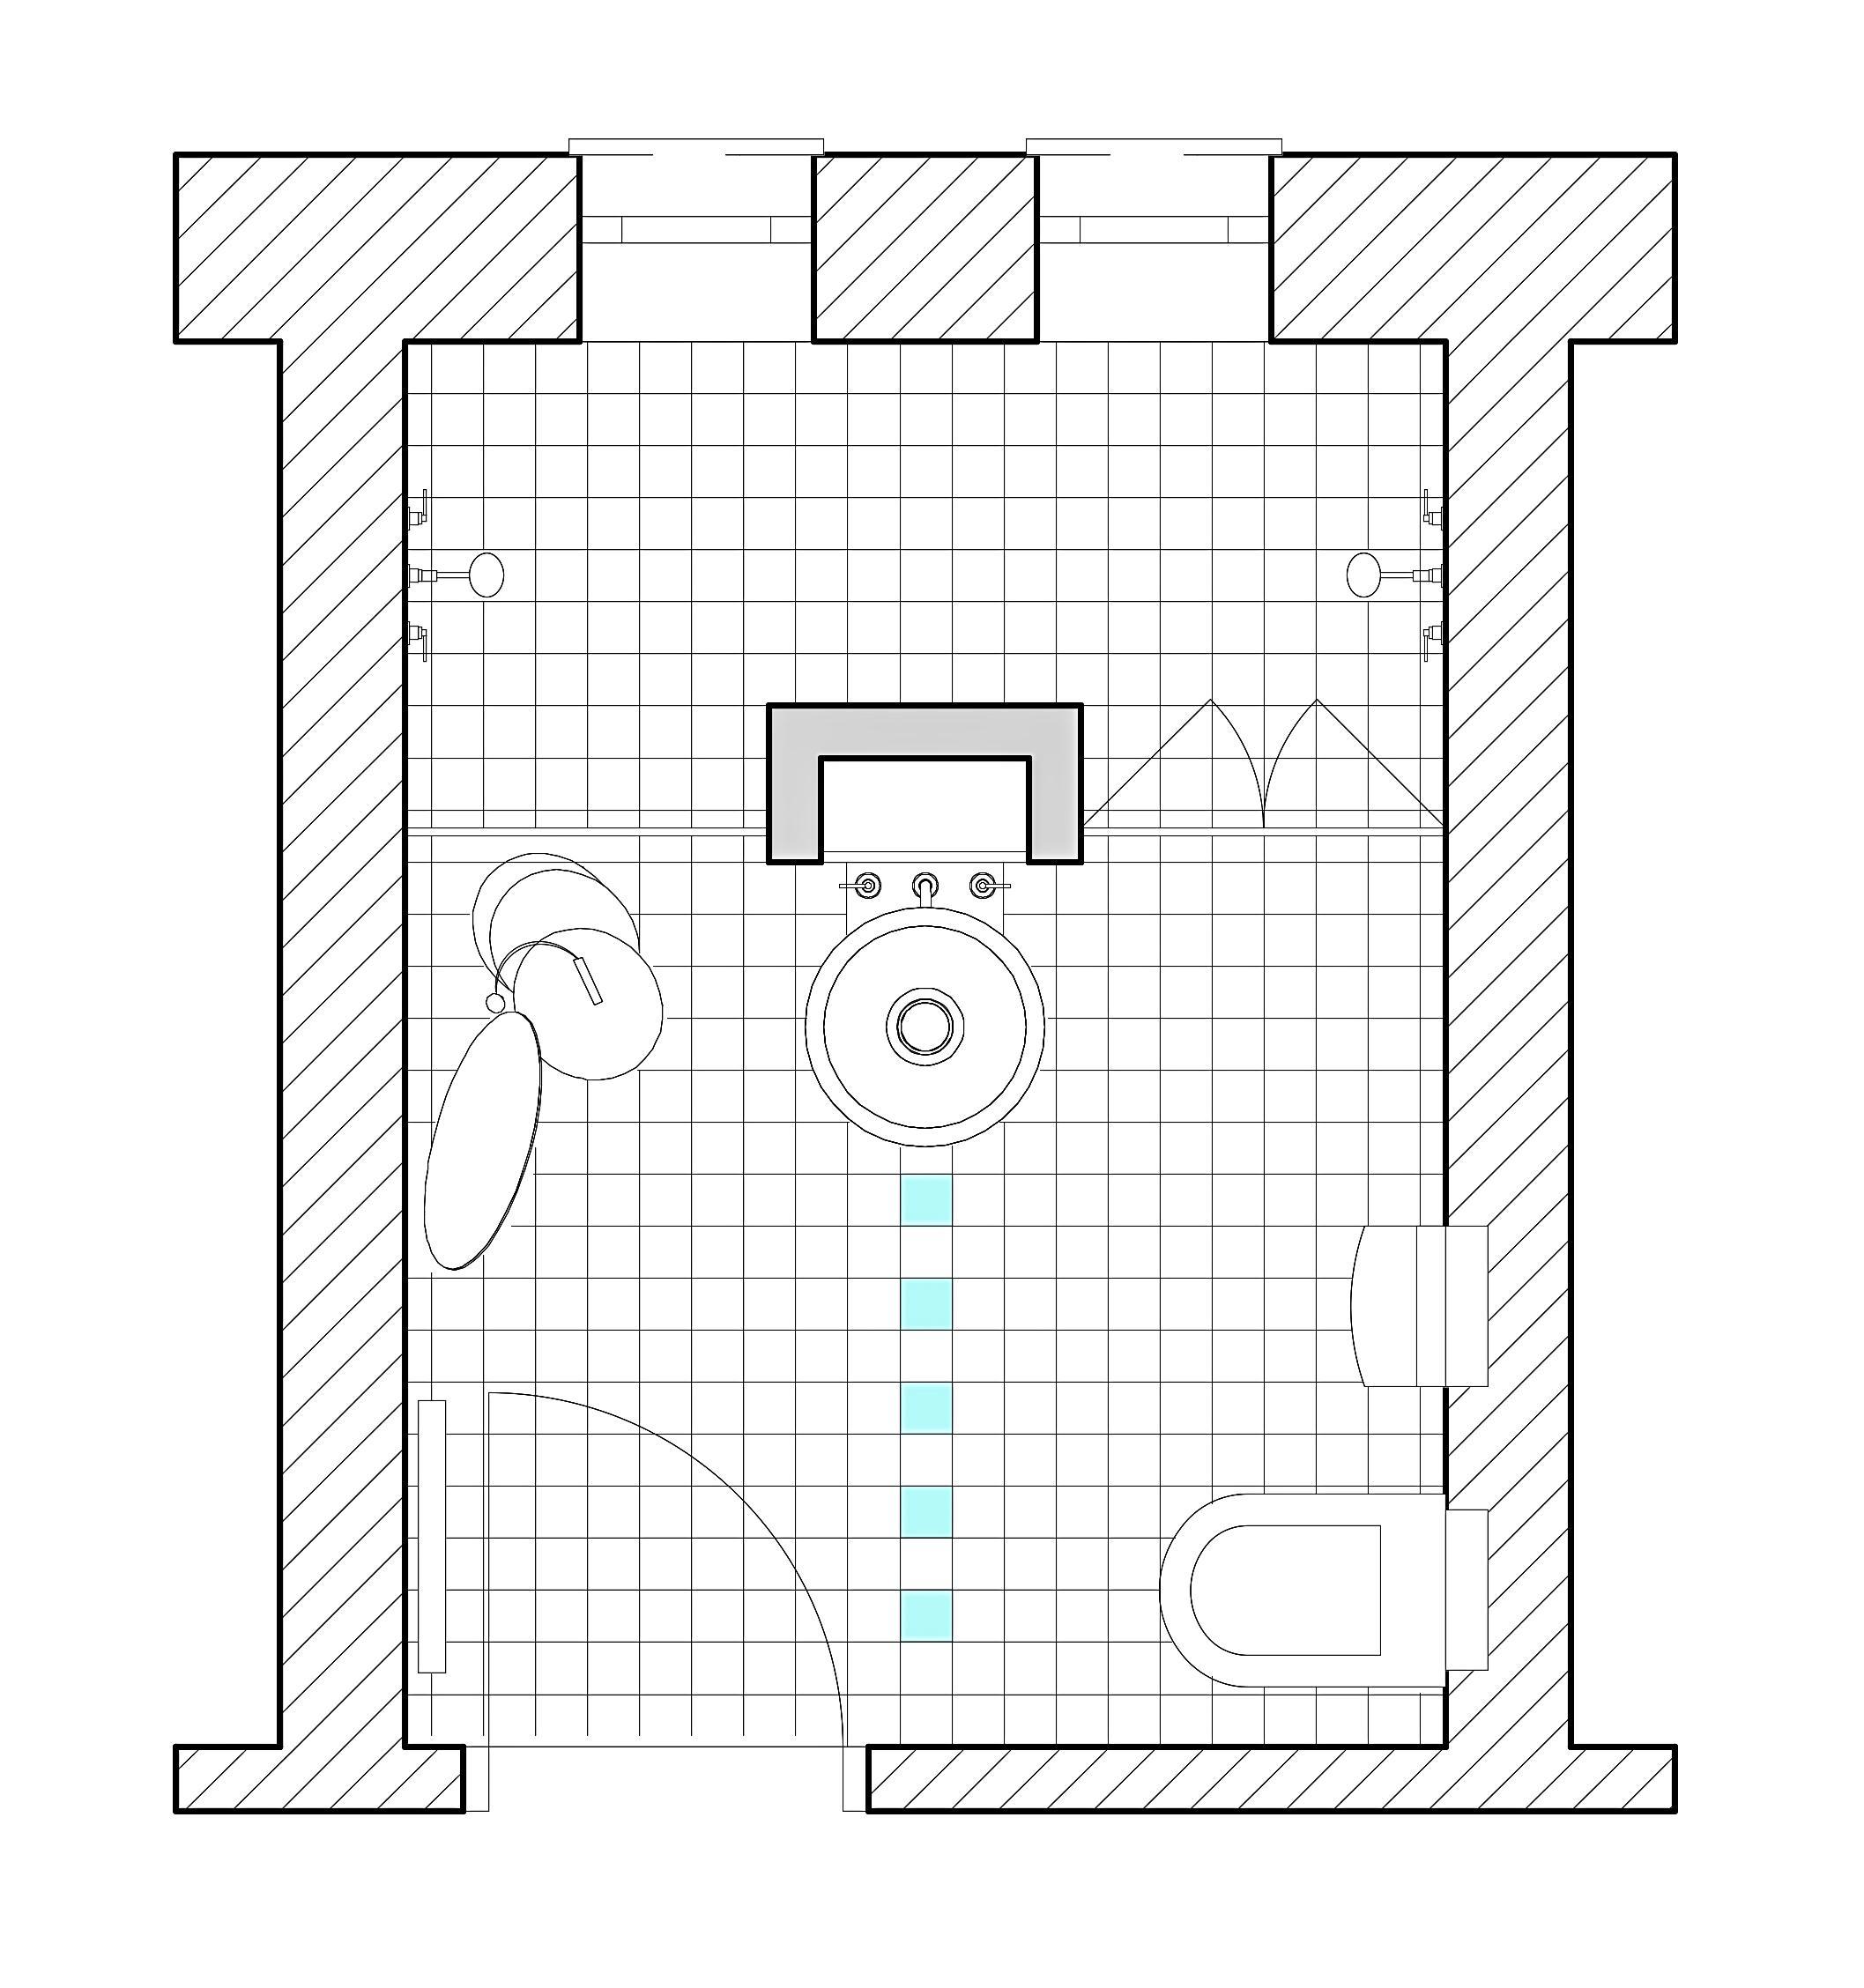 Badezimmer Grundriss • Bilder & Ideen • COUCH